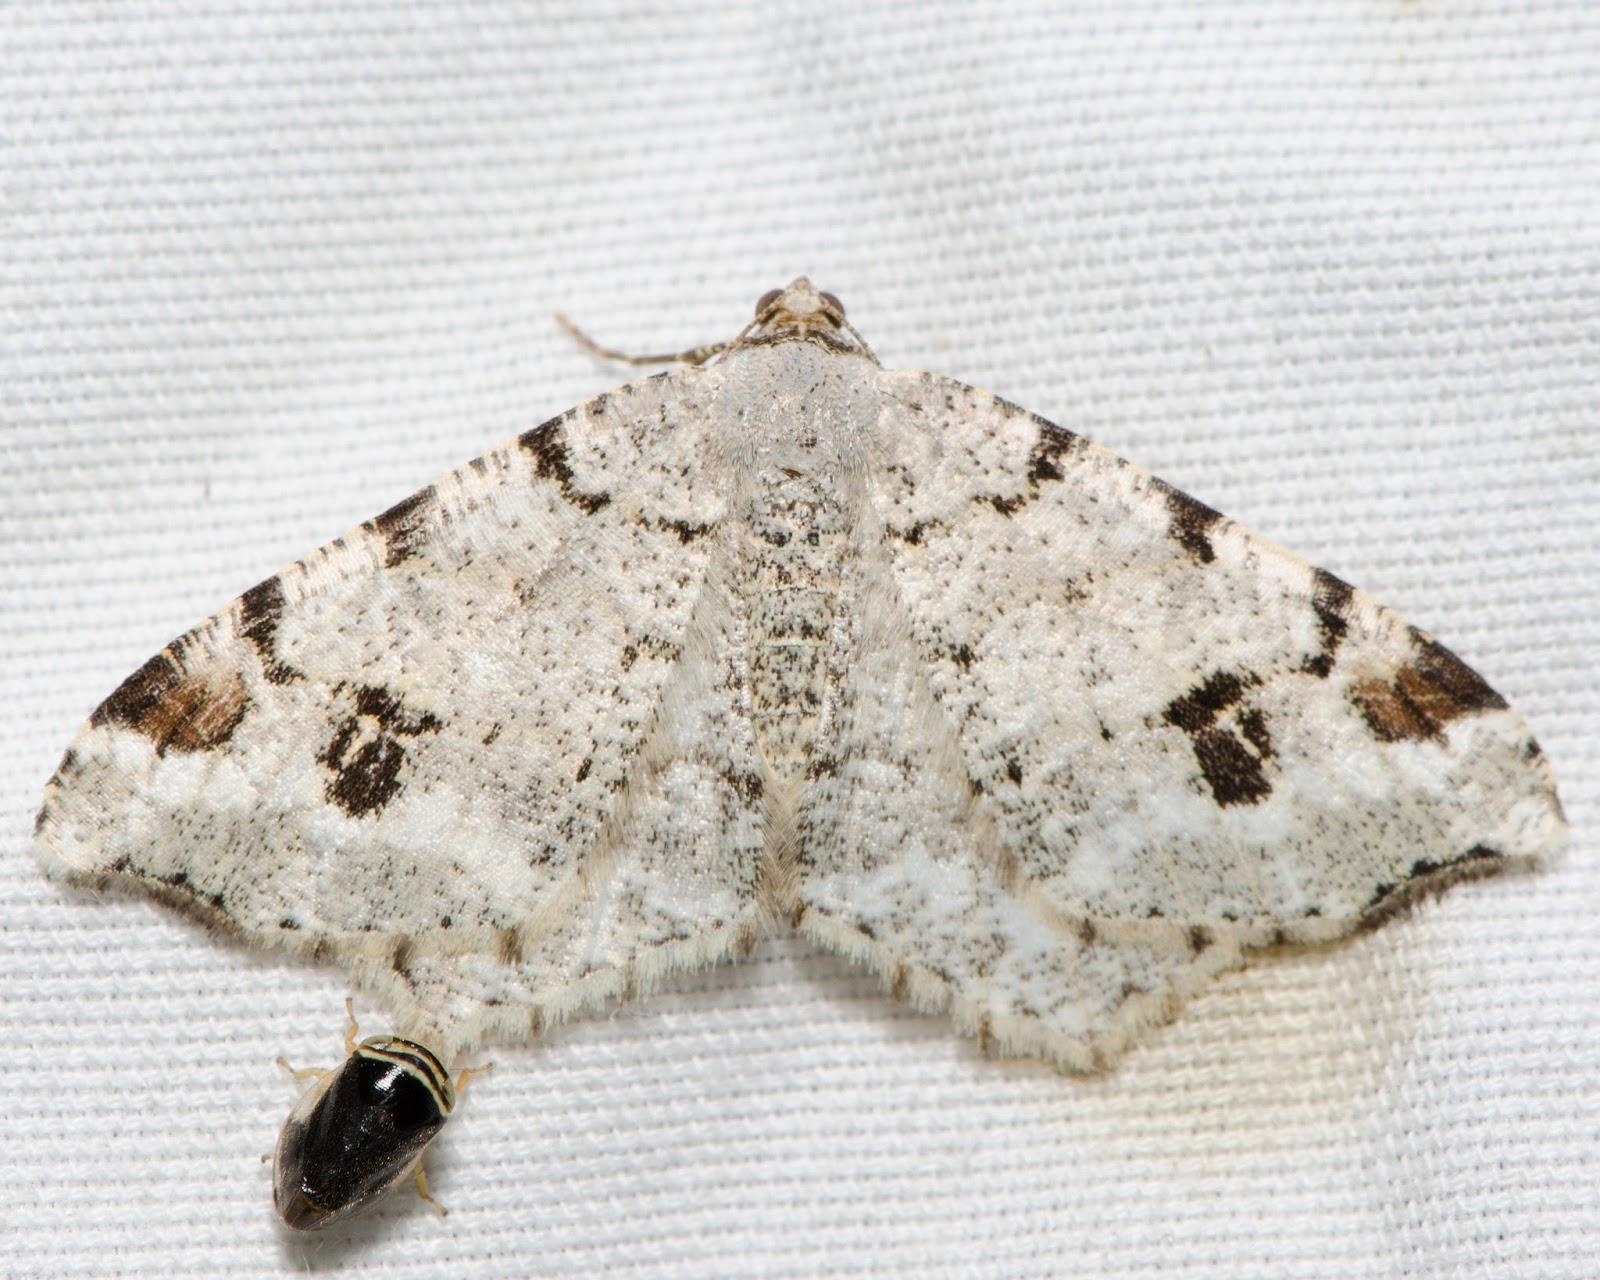 Hemlock Angle (Macaria fissinotata)